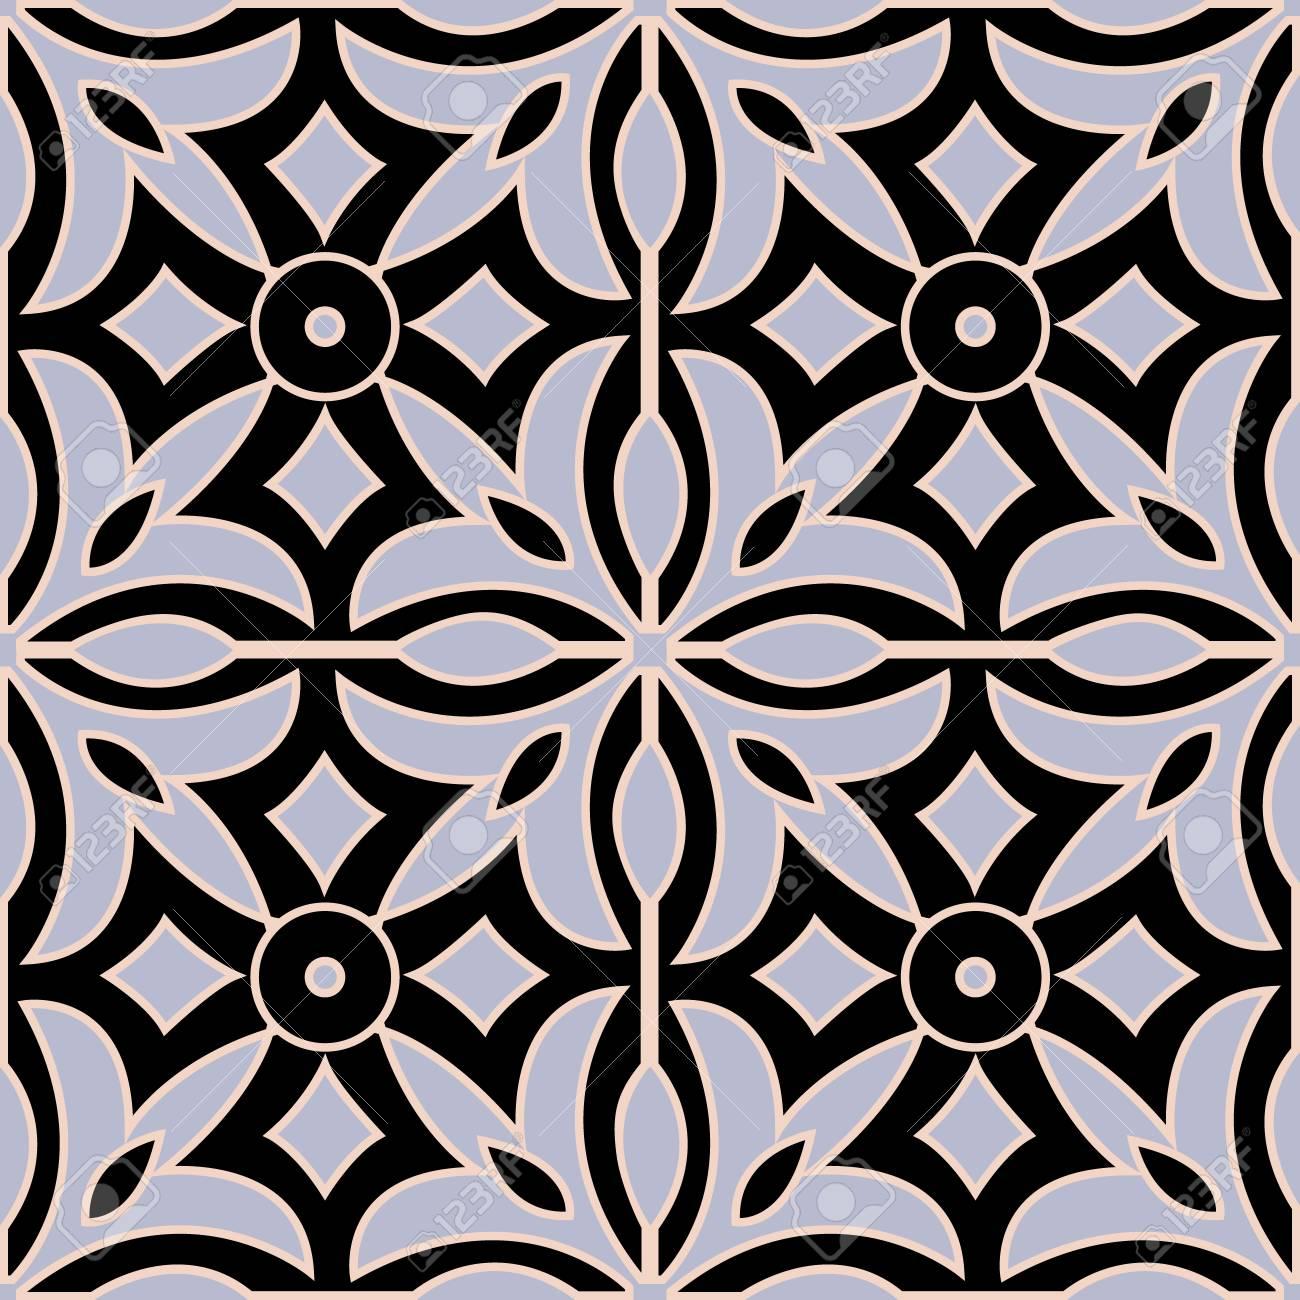 the moroccan mural decorative design seamless pattern and ceramic